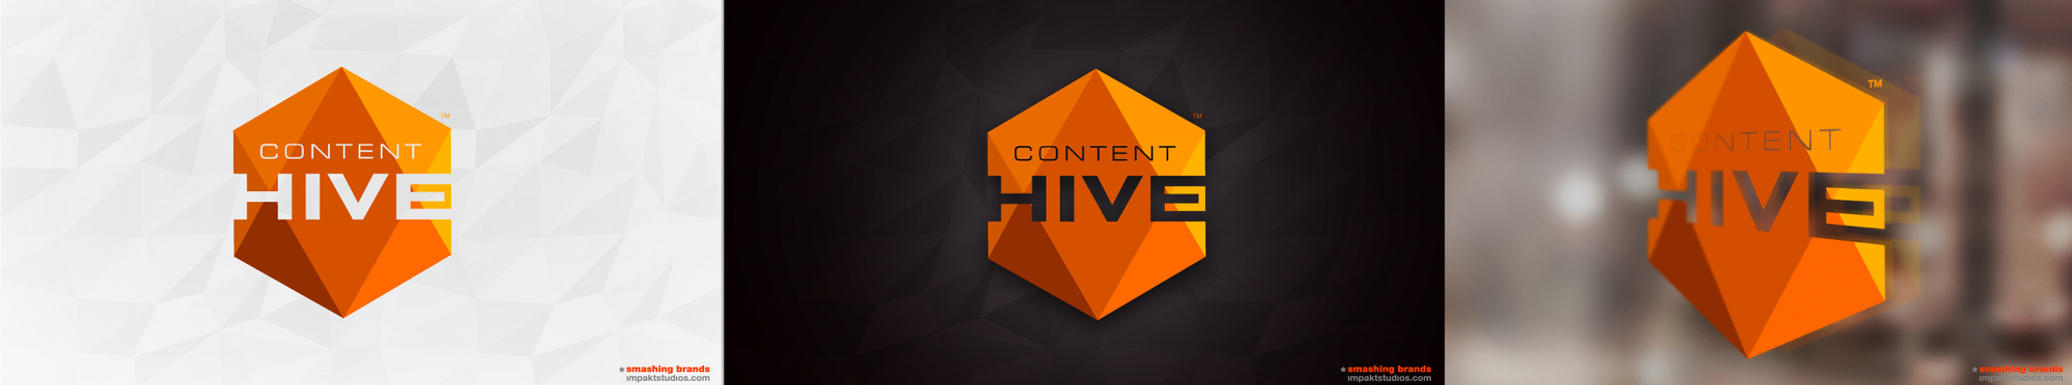 Content Hive Concept 4 by crezo